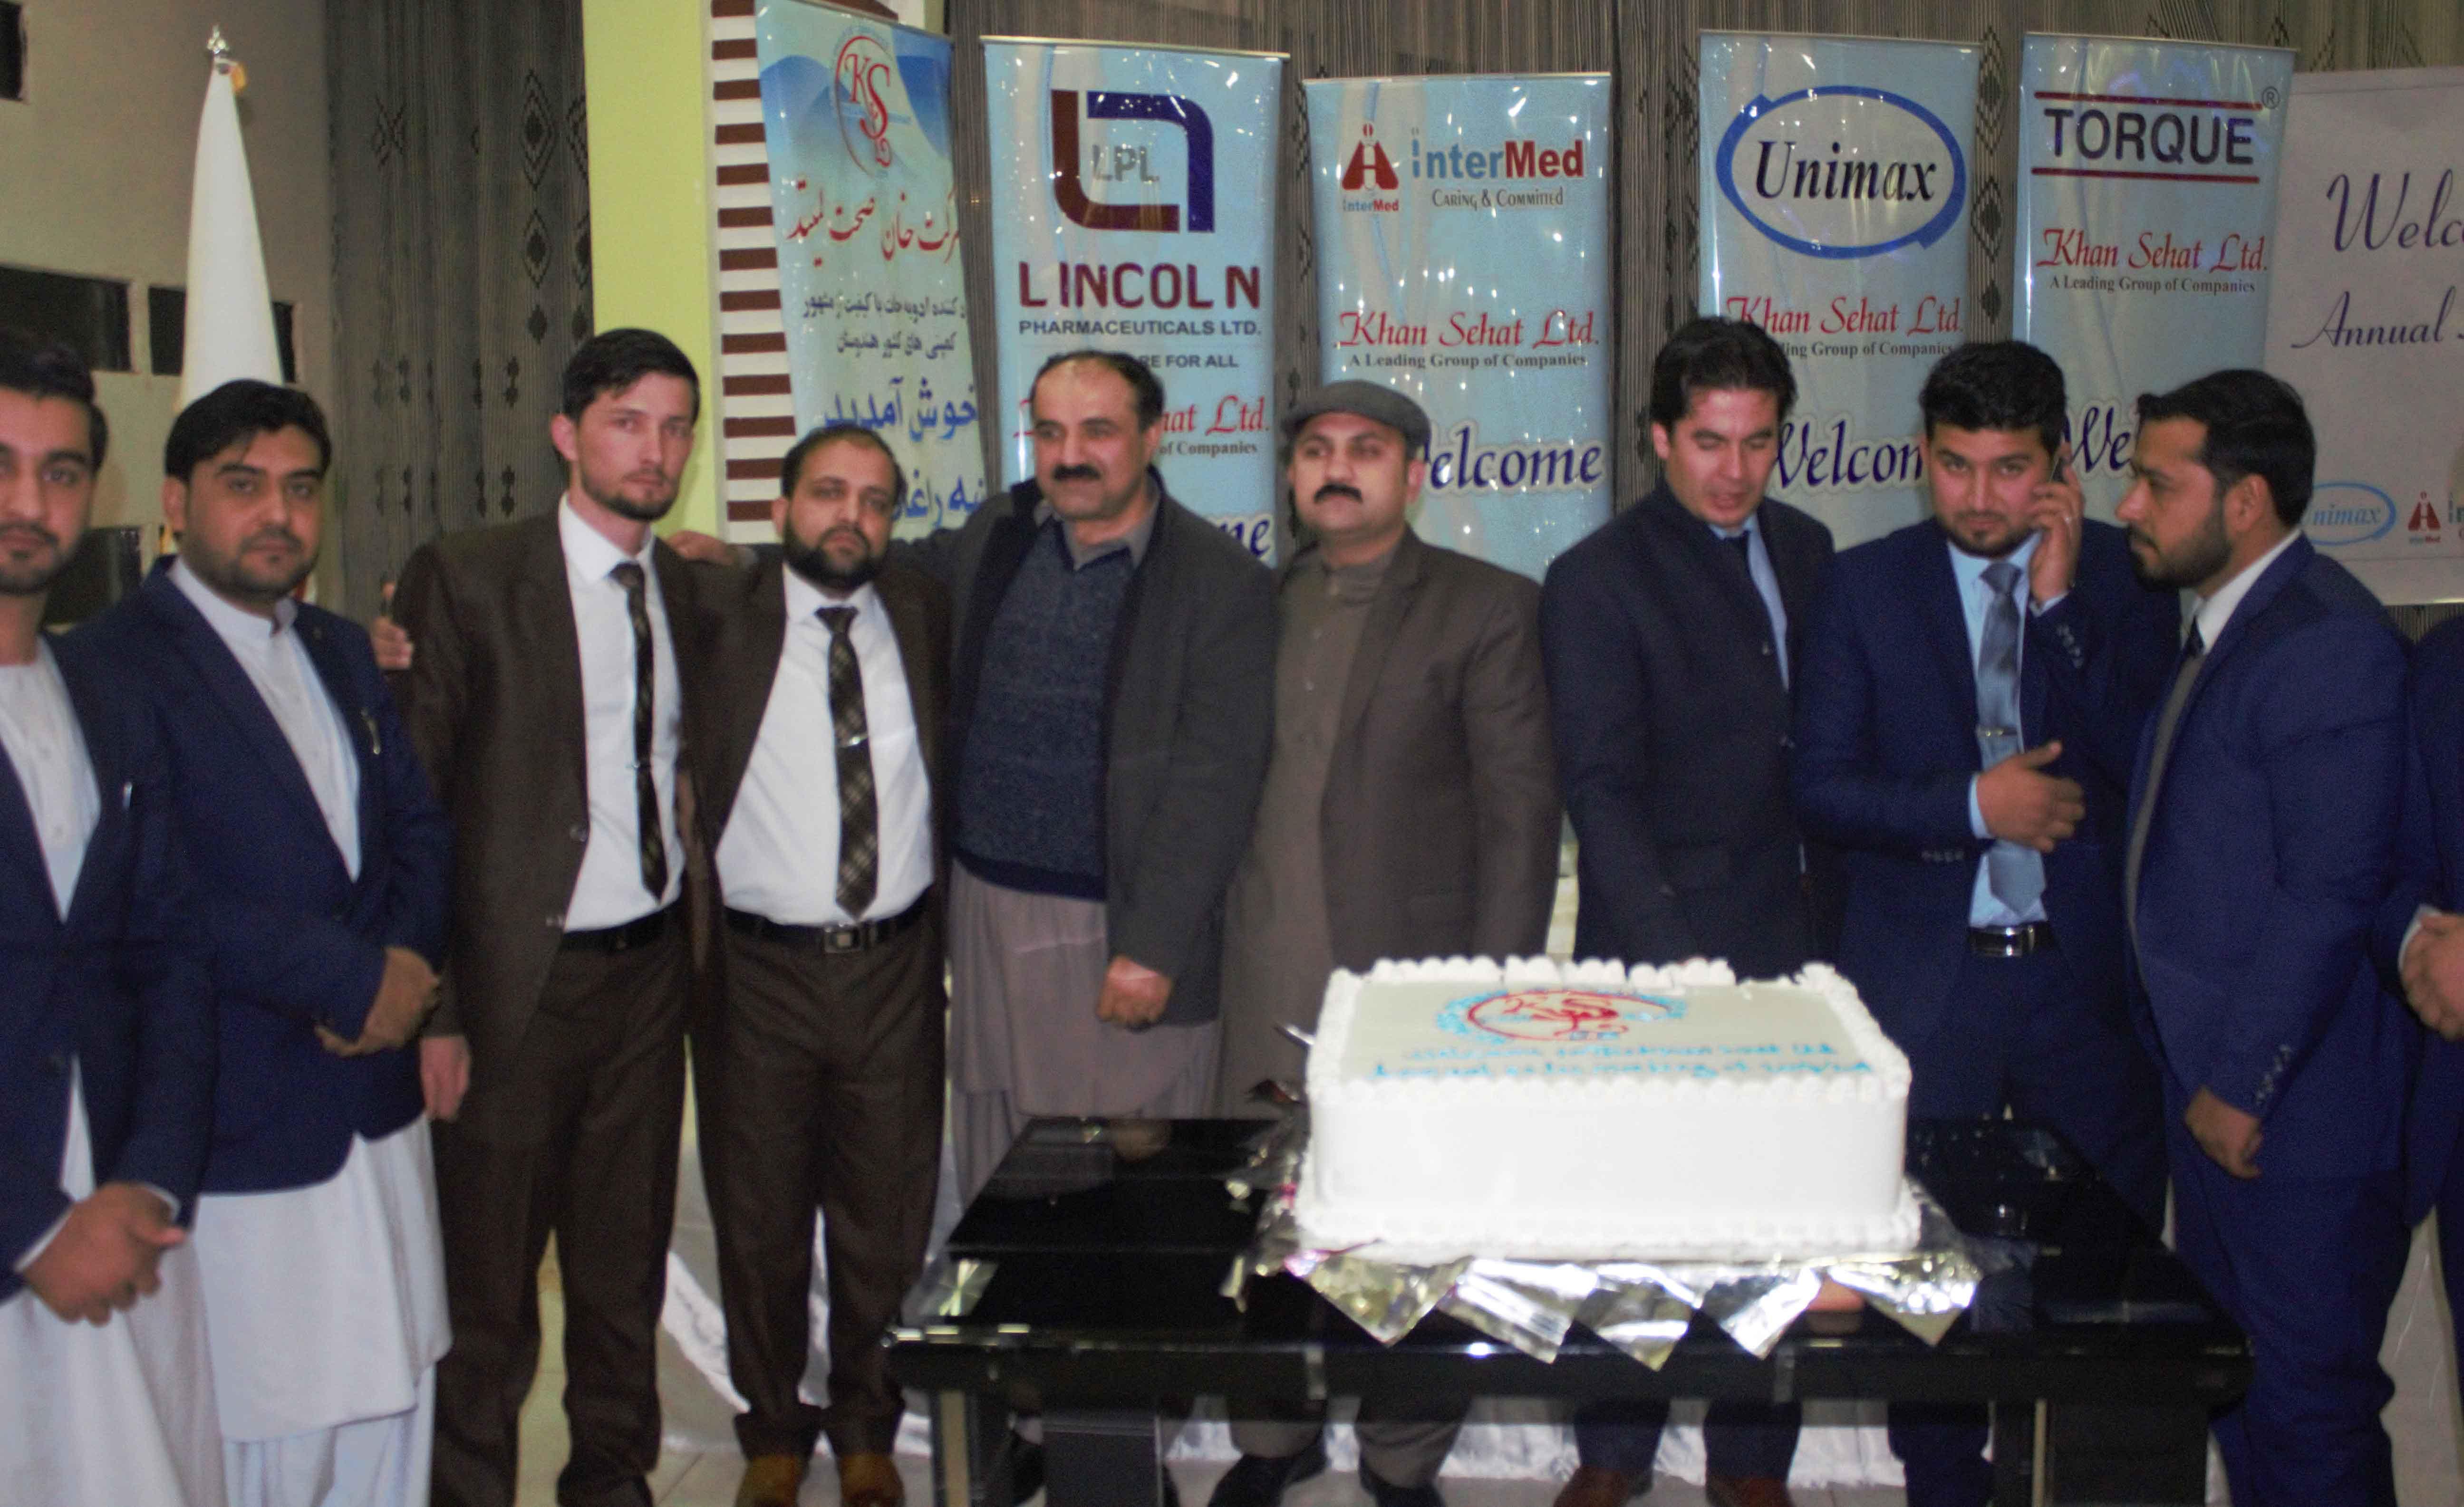 KSL Anniversary